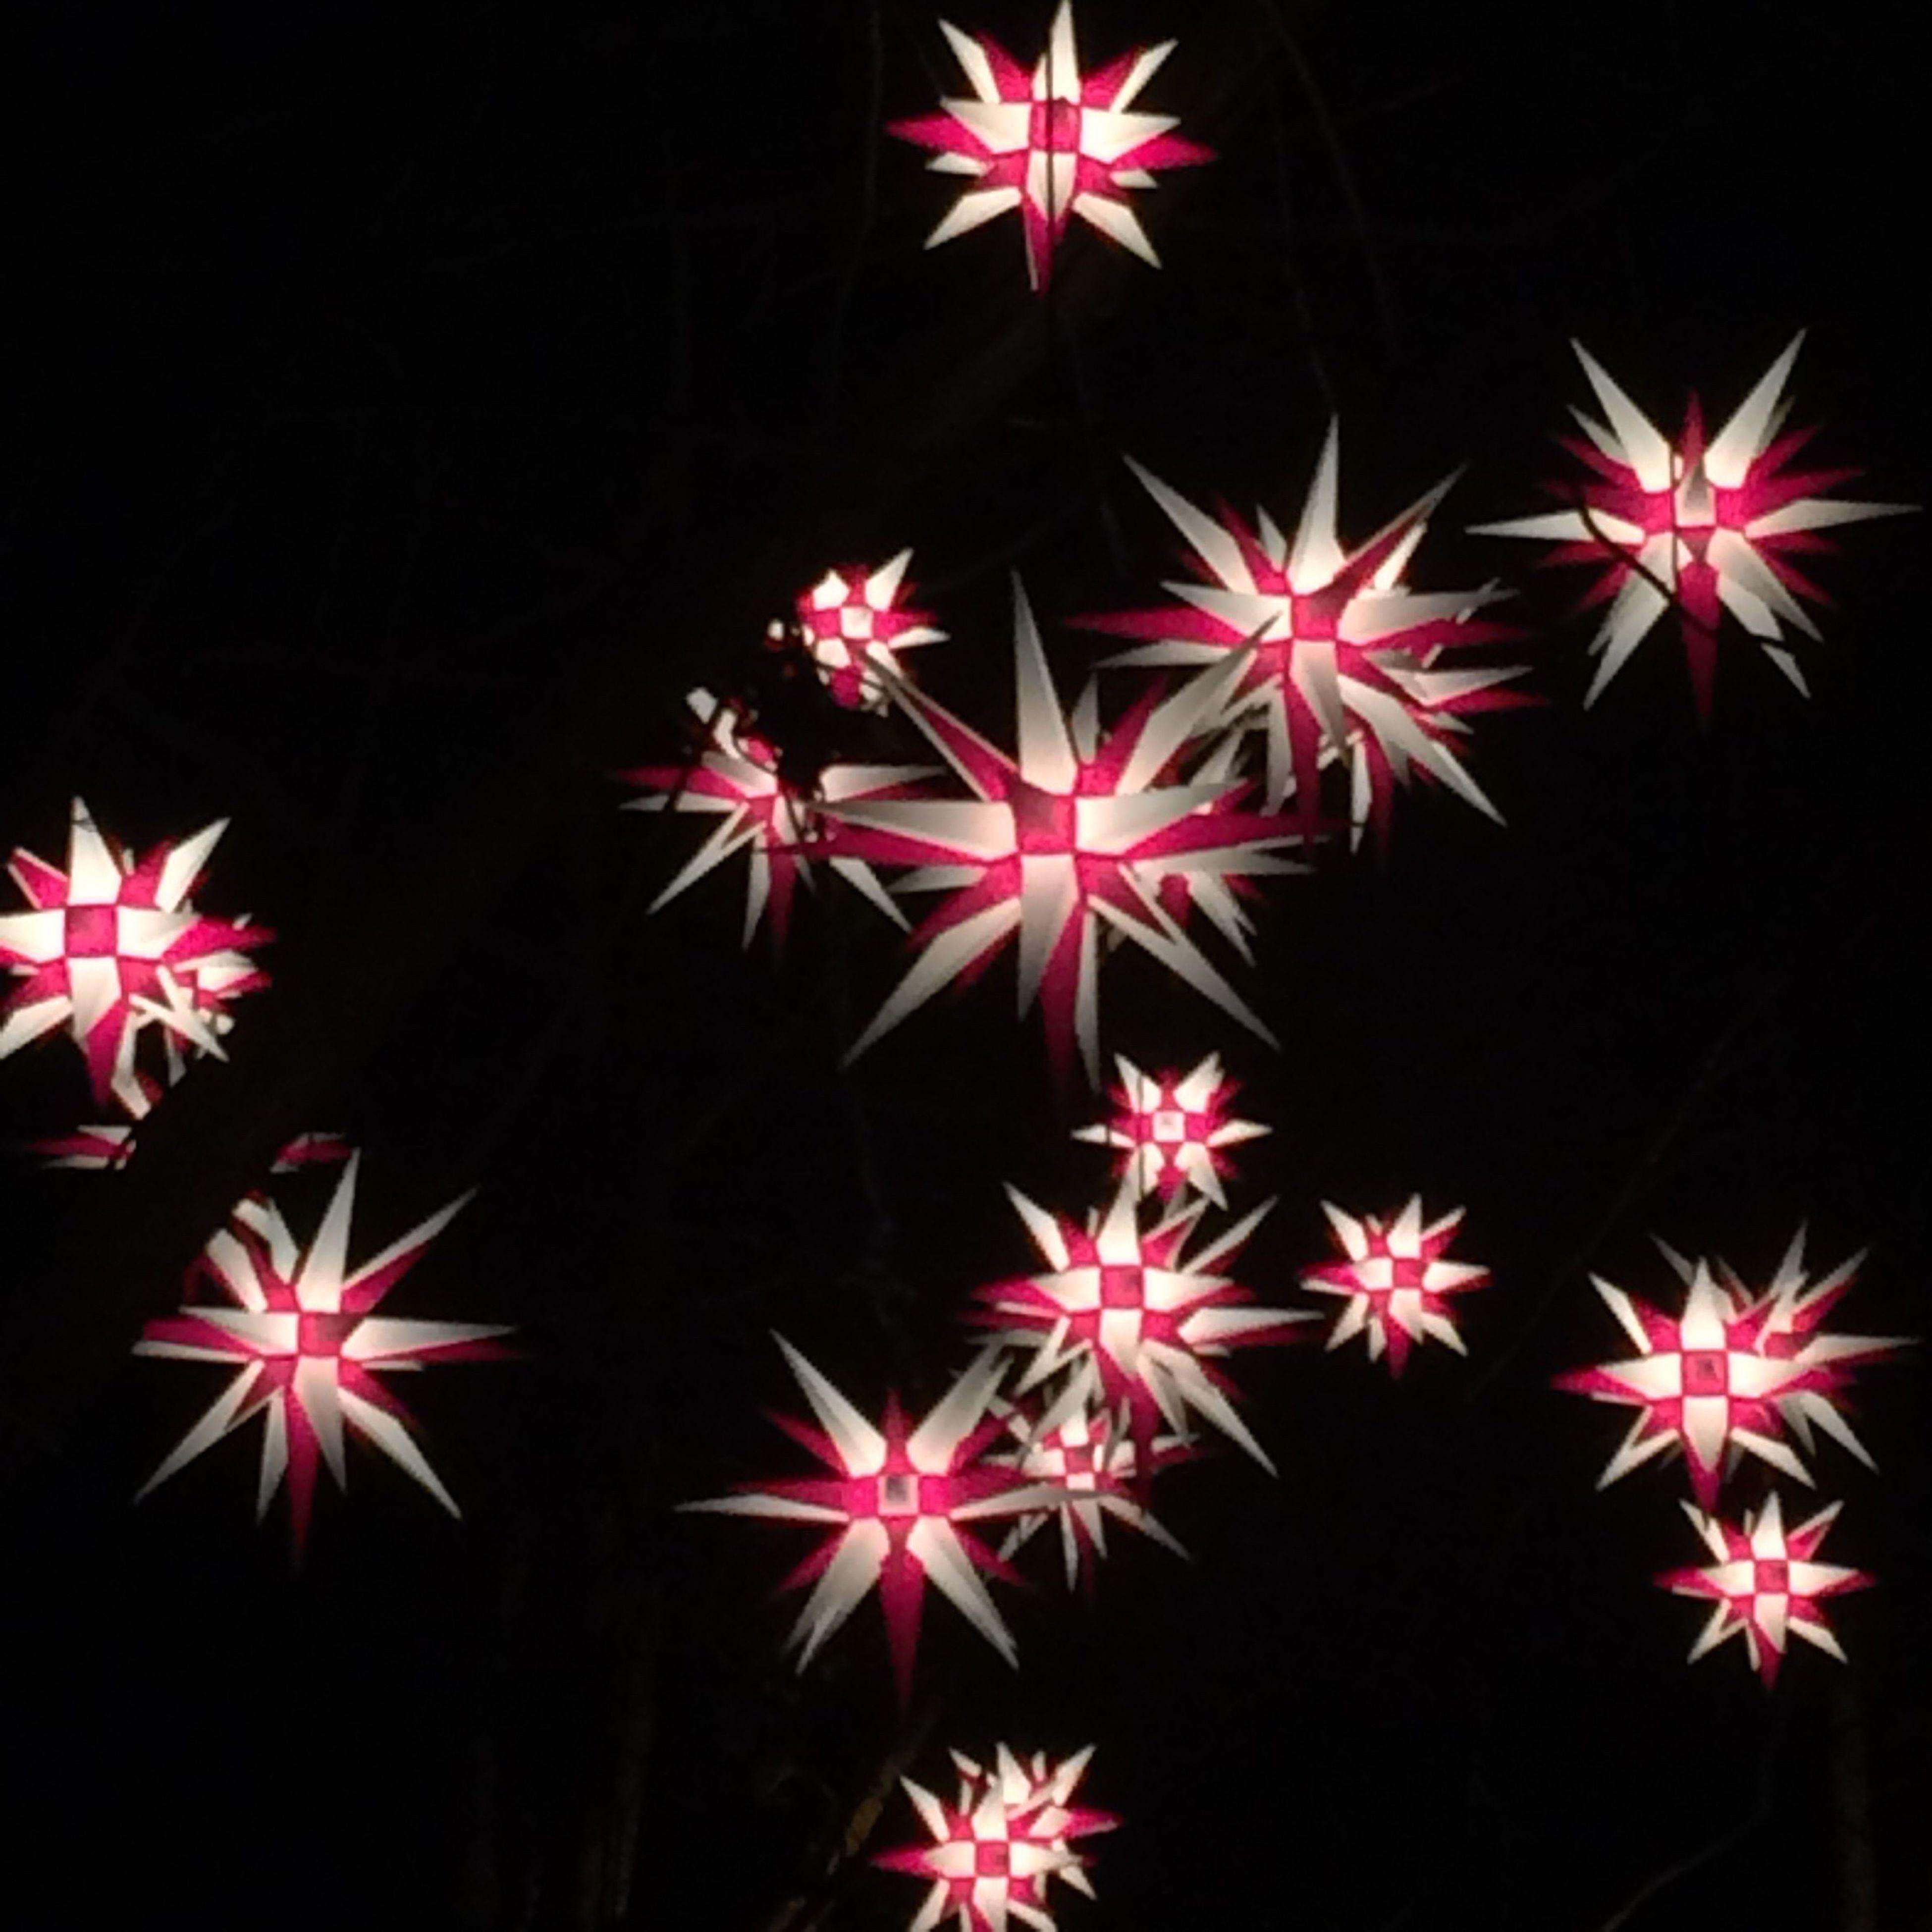 night, celebration, firework display, no people, firework - man made object, firework, sky, exploding, christmas decoration, outdoors